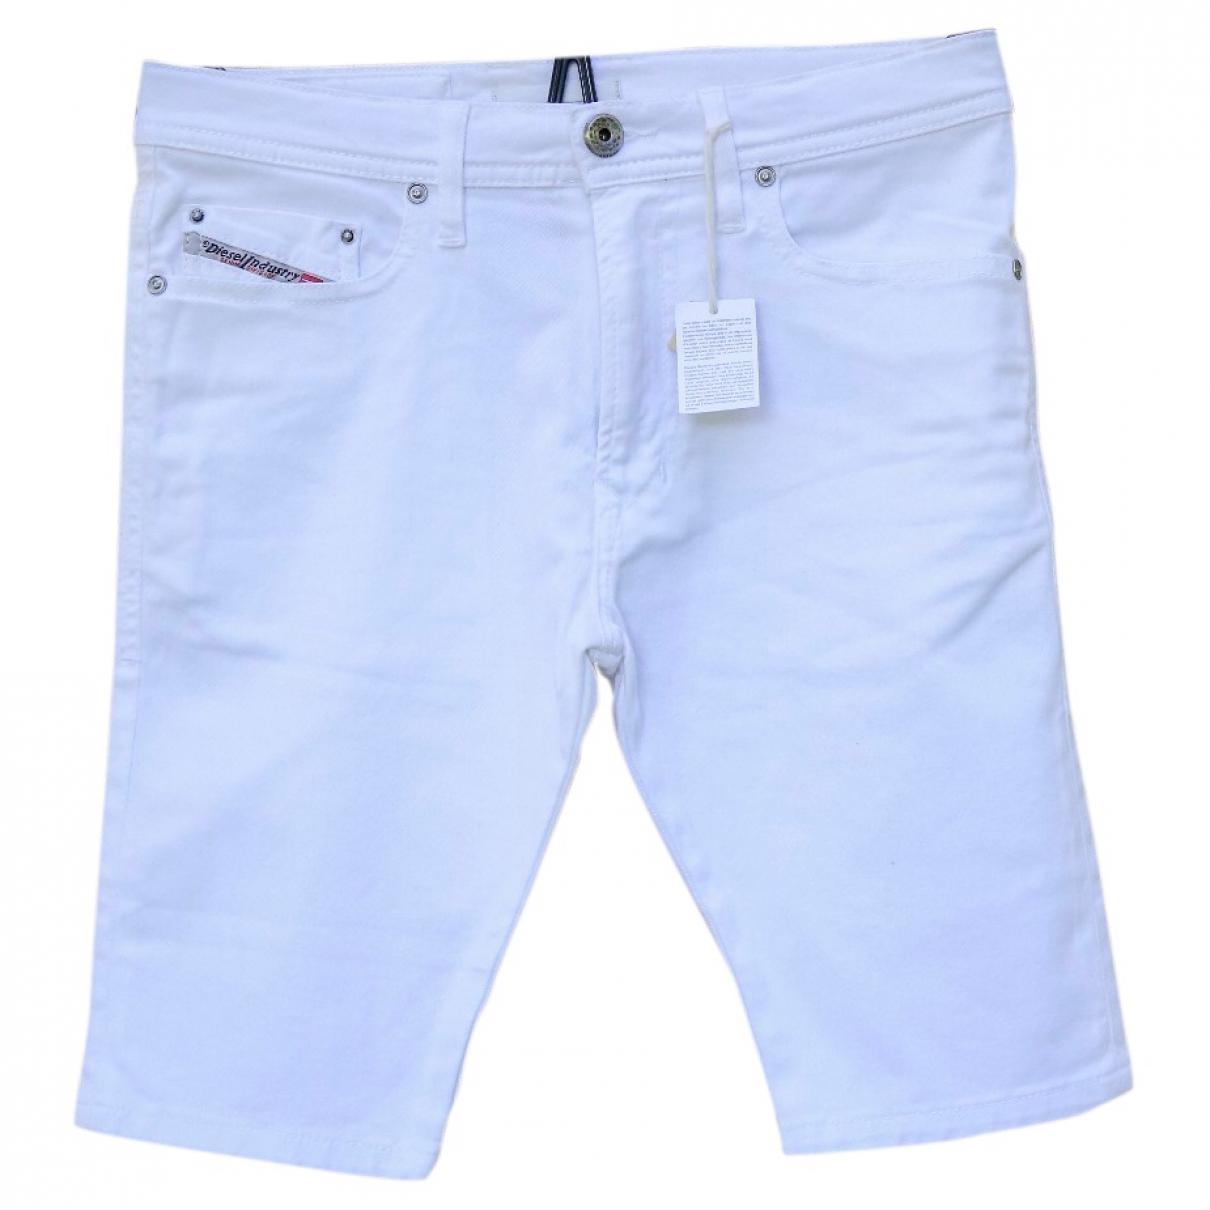 Diesel - Pantalon   pour enfant en coton - blanc